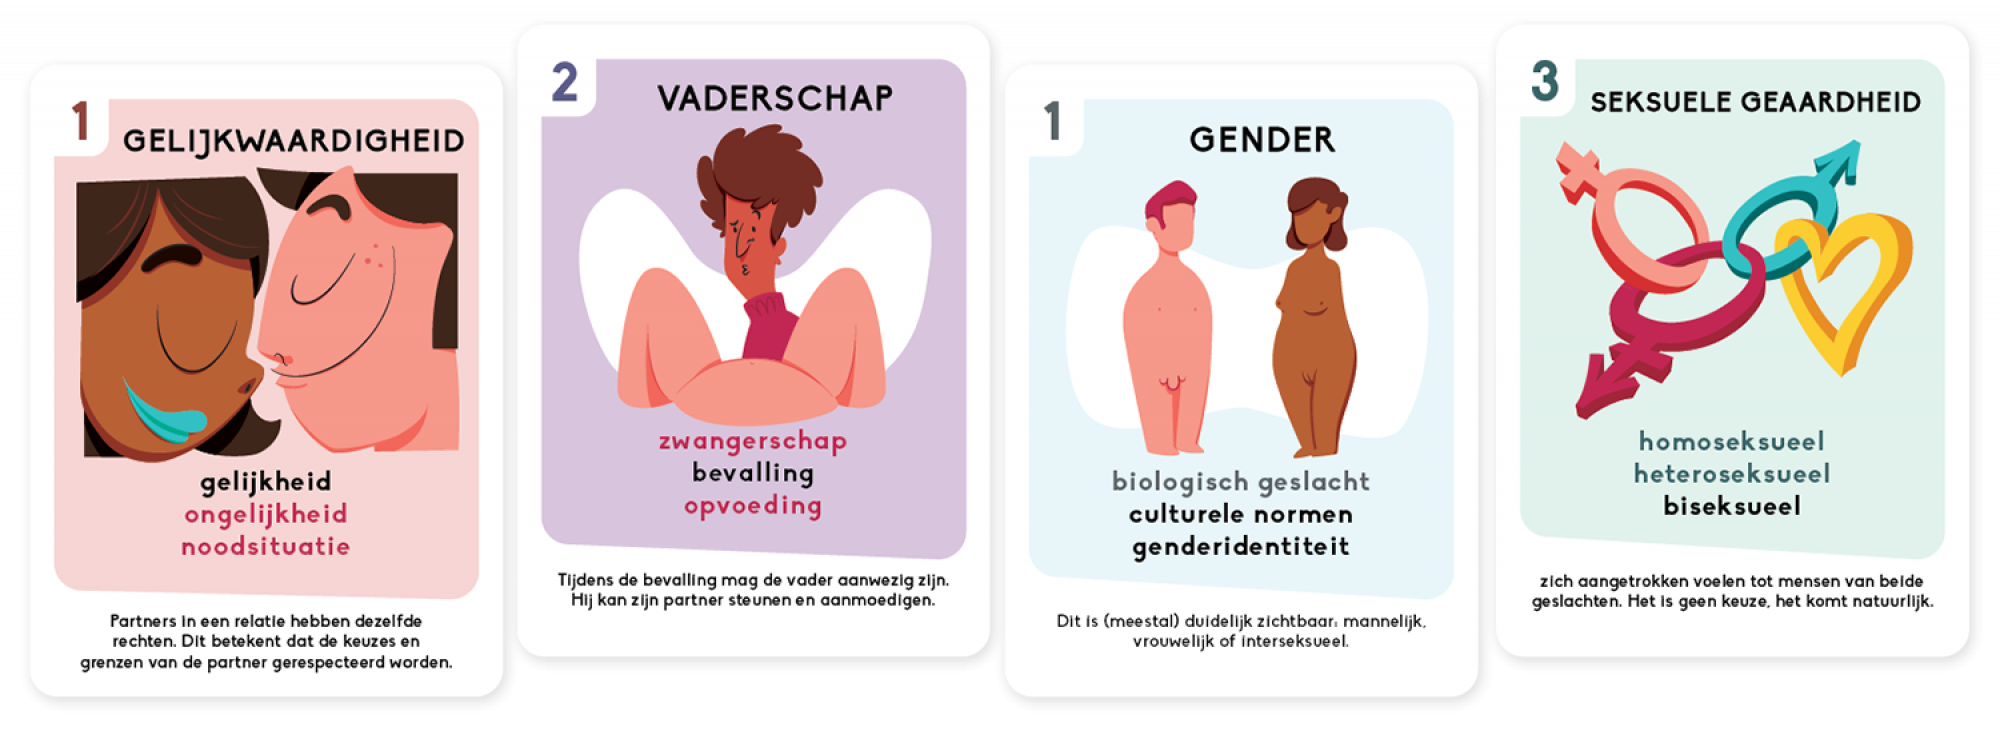 play4progress illustration deck gent education sexual health